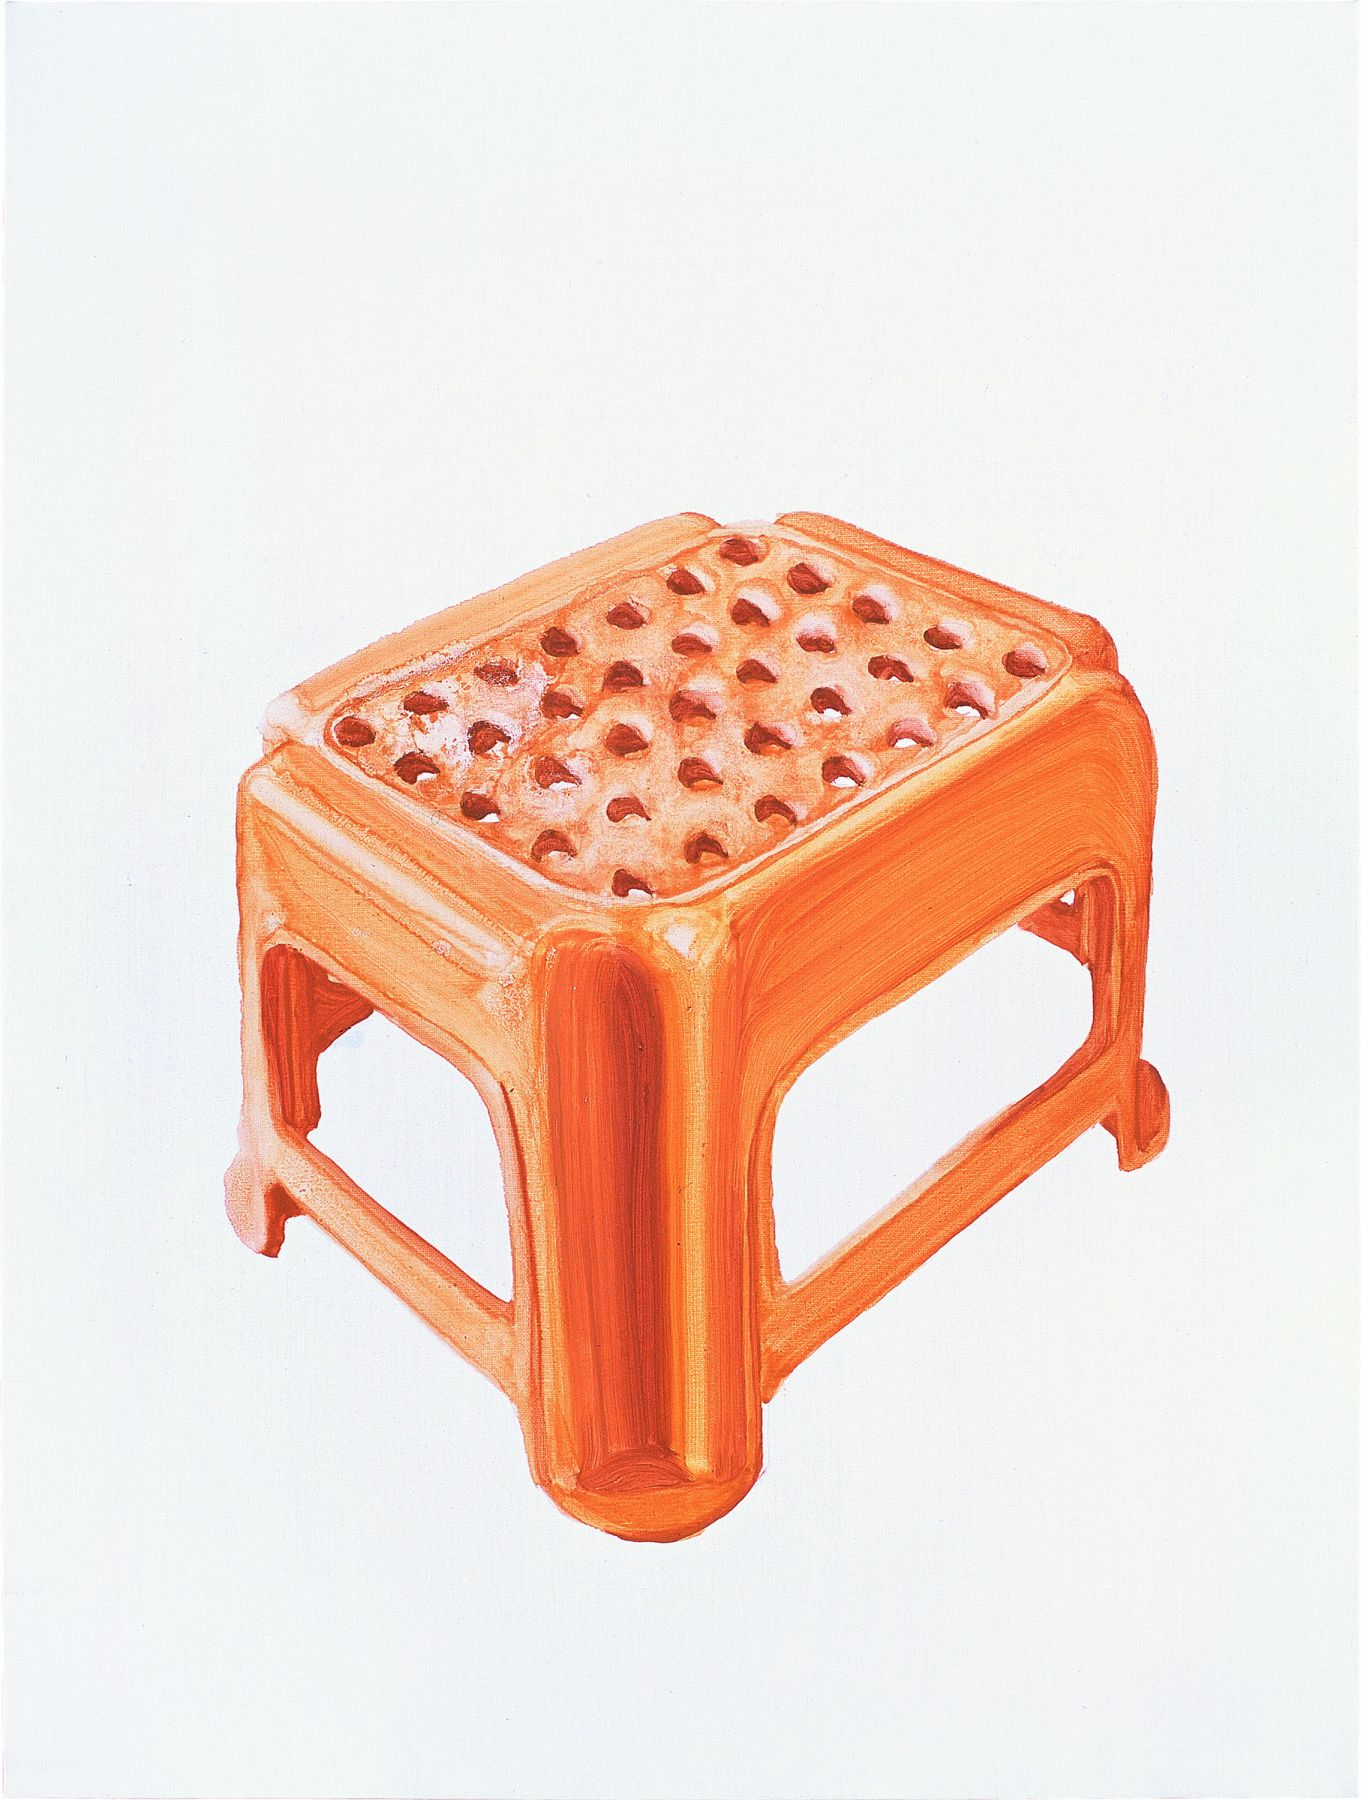 Orange Plastic Stool No.1æ©™è‰²å¡'料凳1, 2009